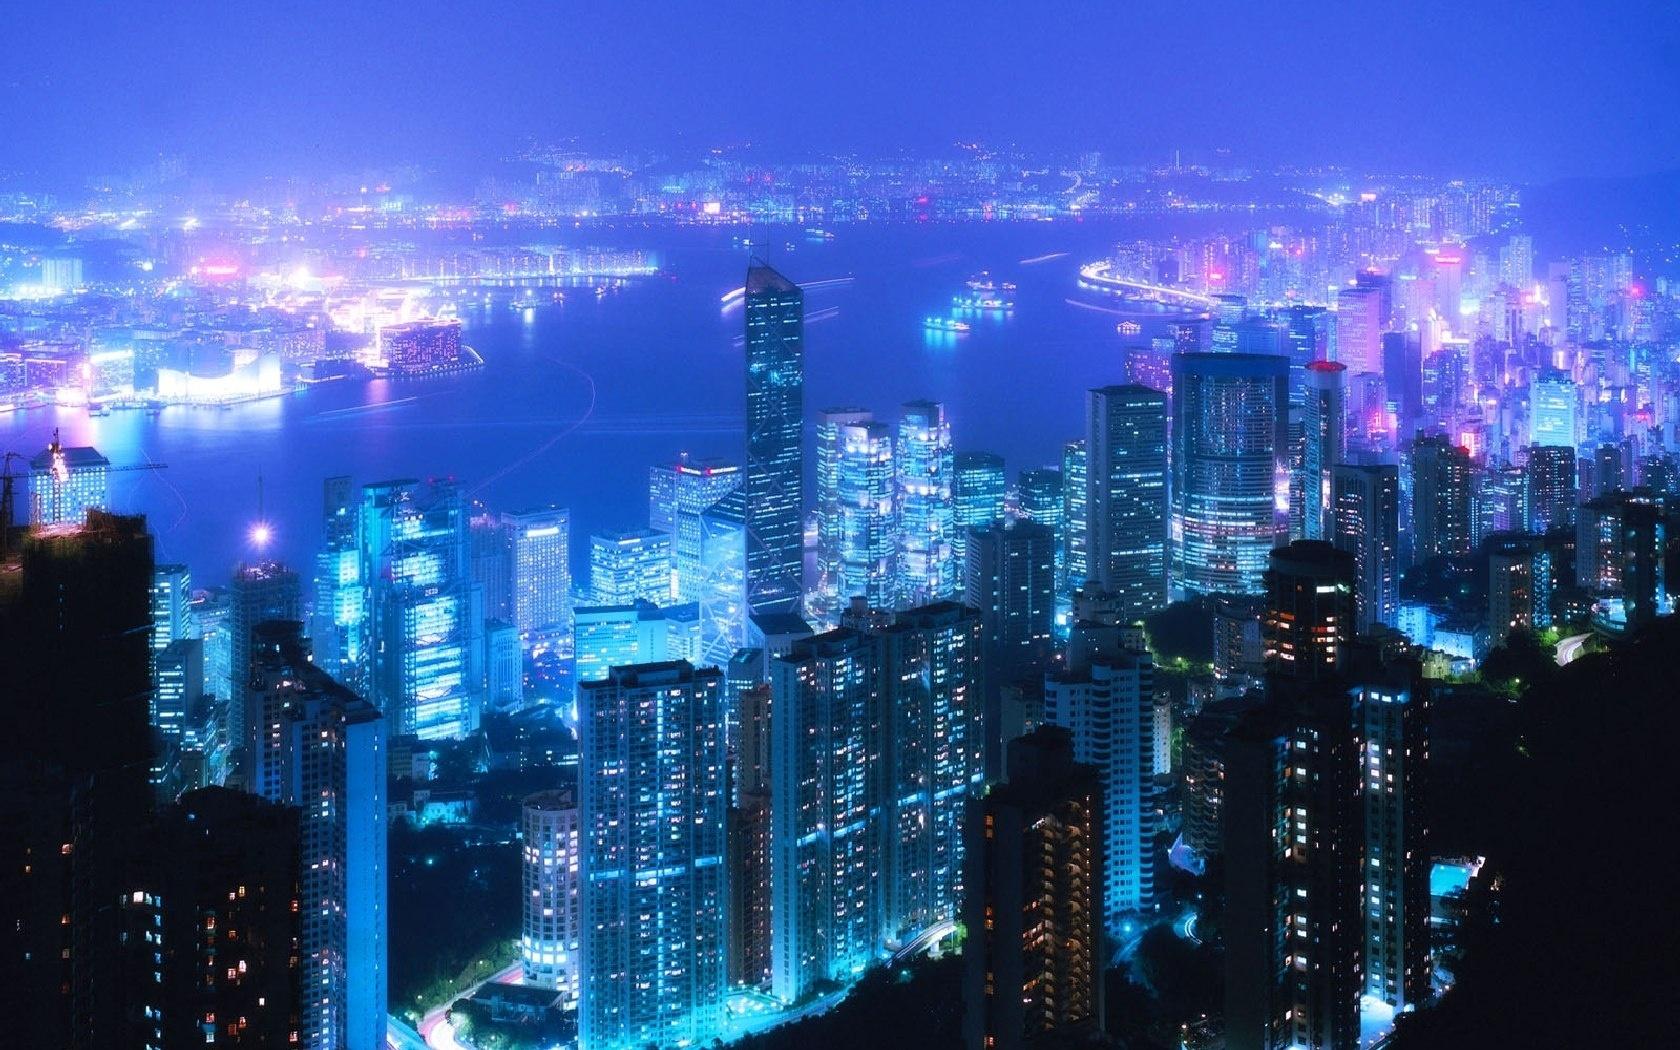 wallpaper : city, night, tokyo, lanterns, sky, homes 1680x1050